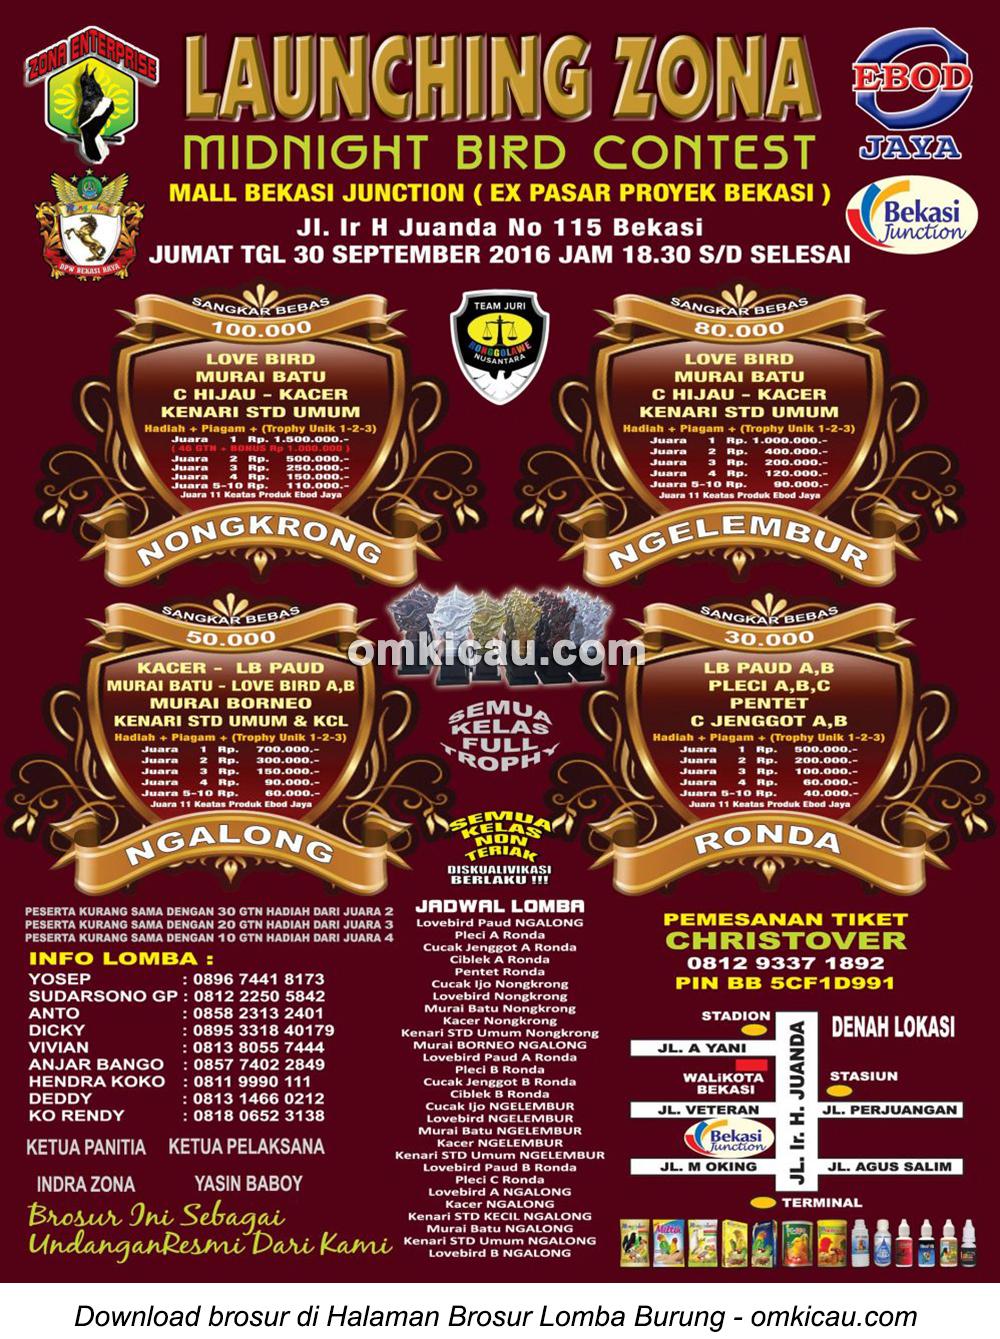 Brosur Launching Zona Midnight Bird Contest, Bekasi, 30 September 2016